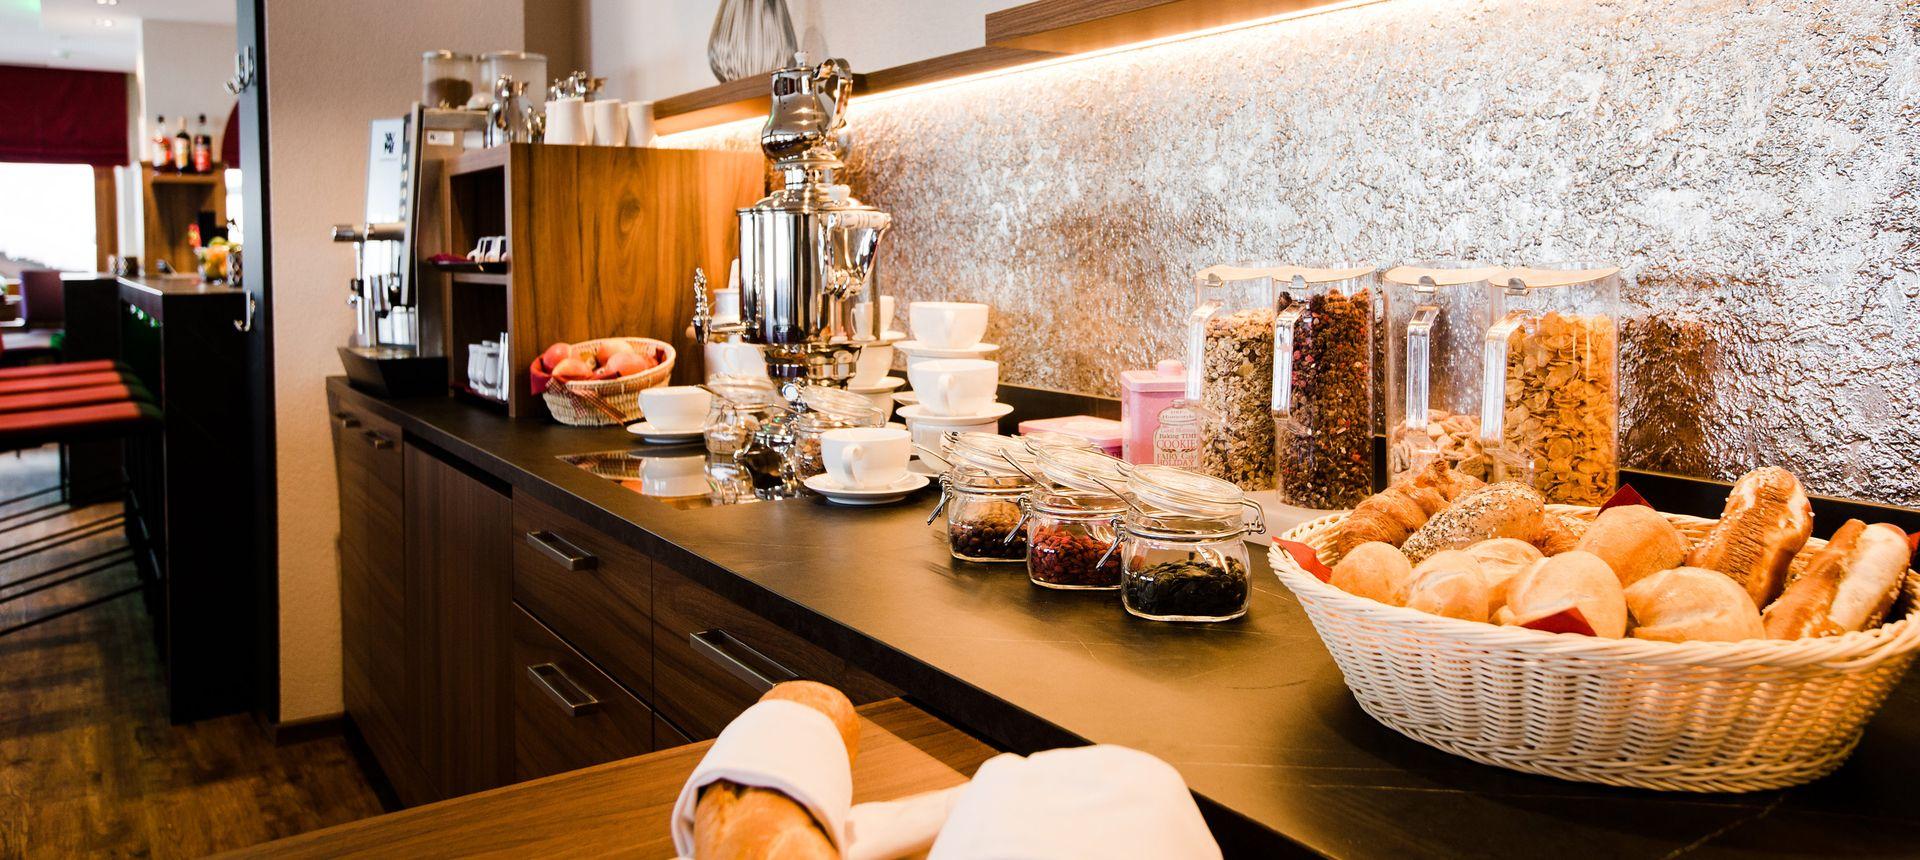 Frühstücksbuffet ©Aparthotel Dorfplatzl